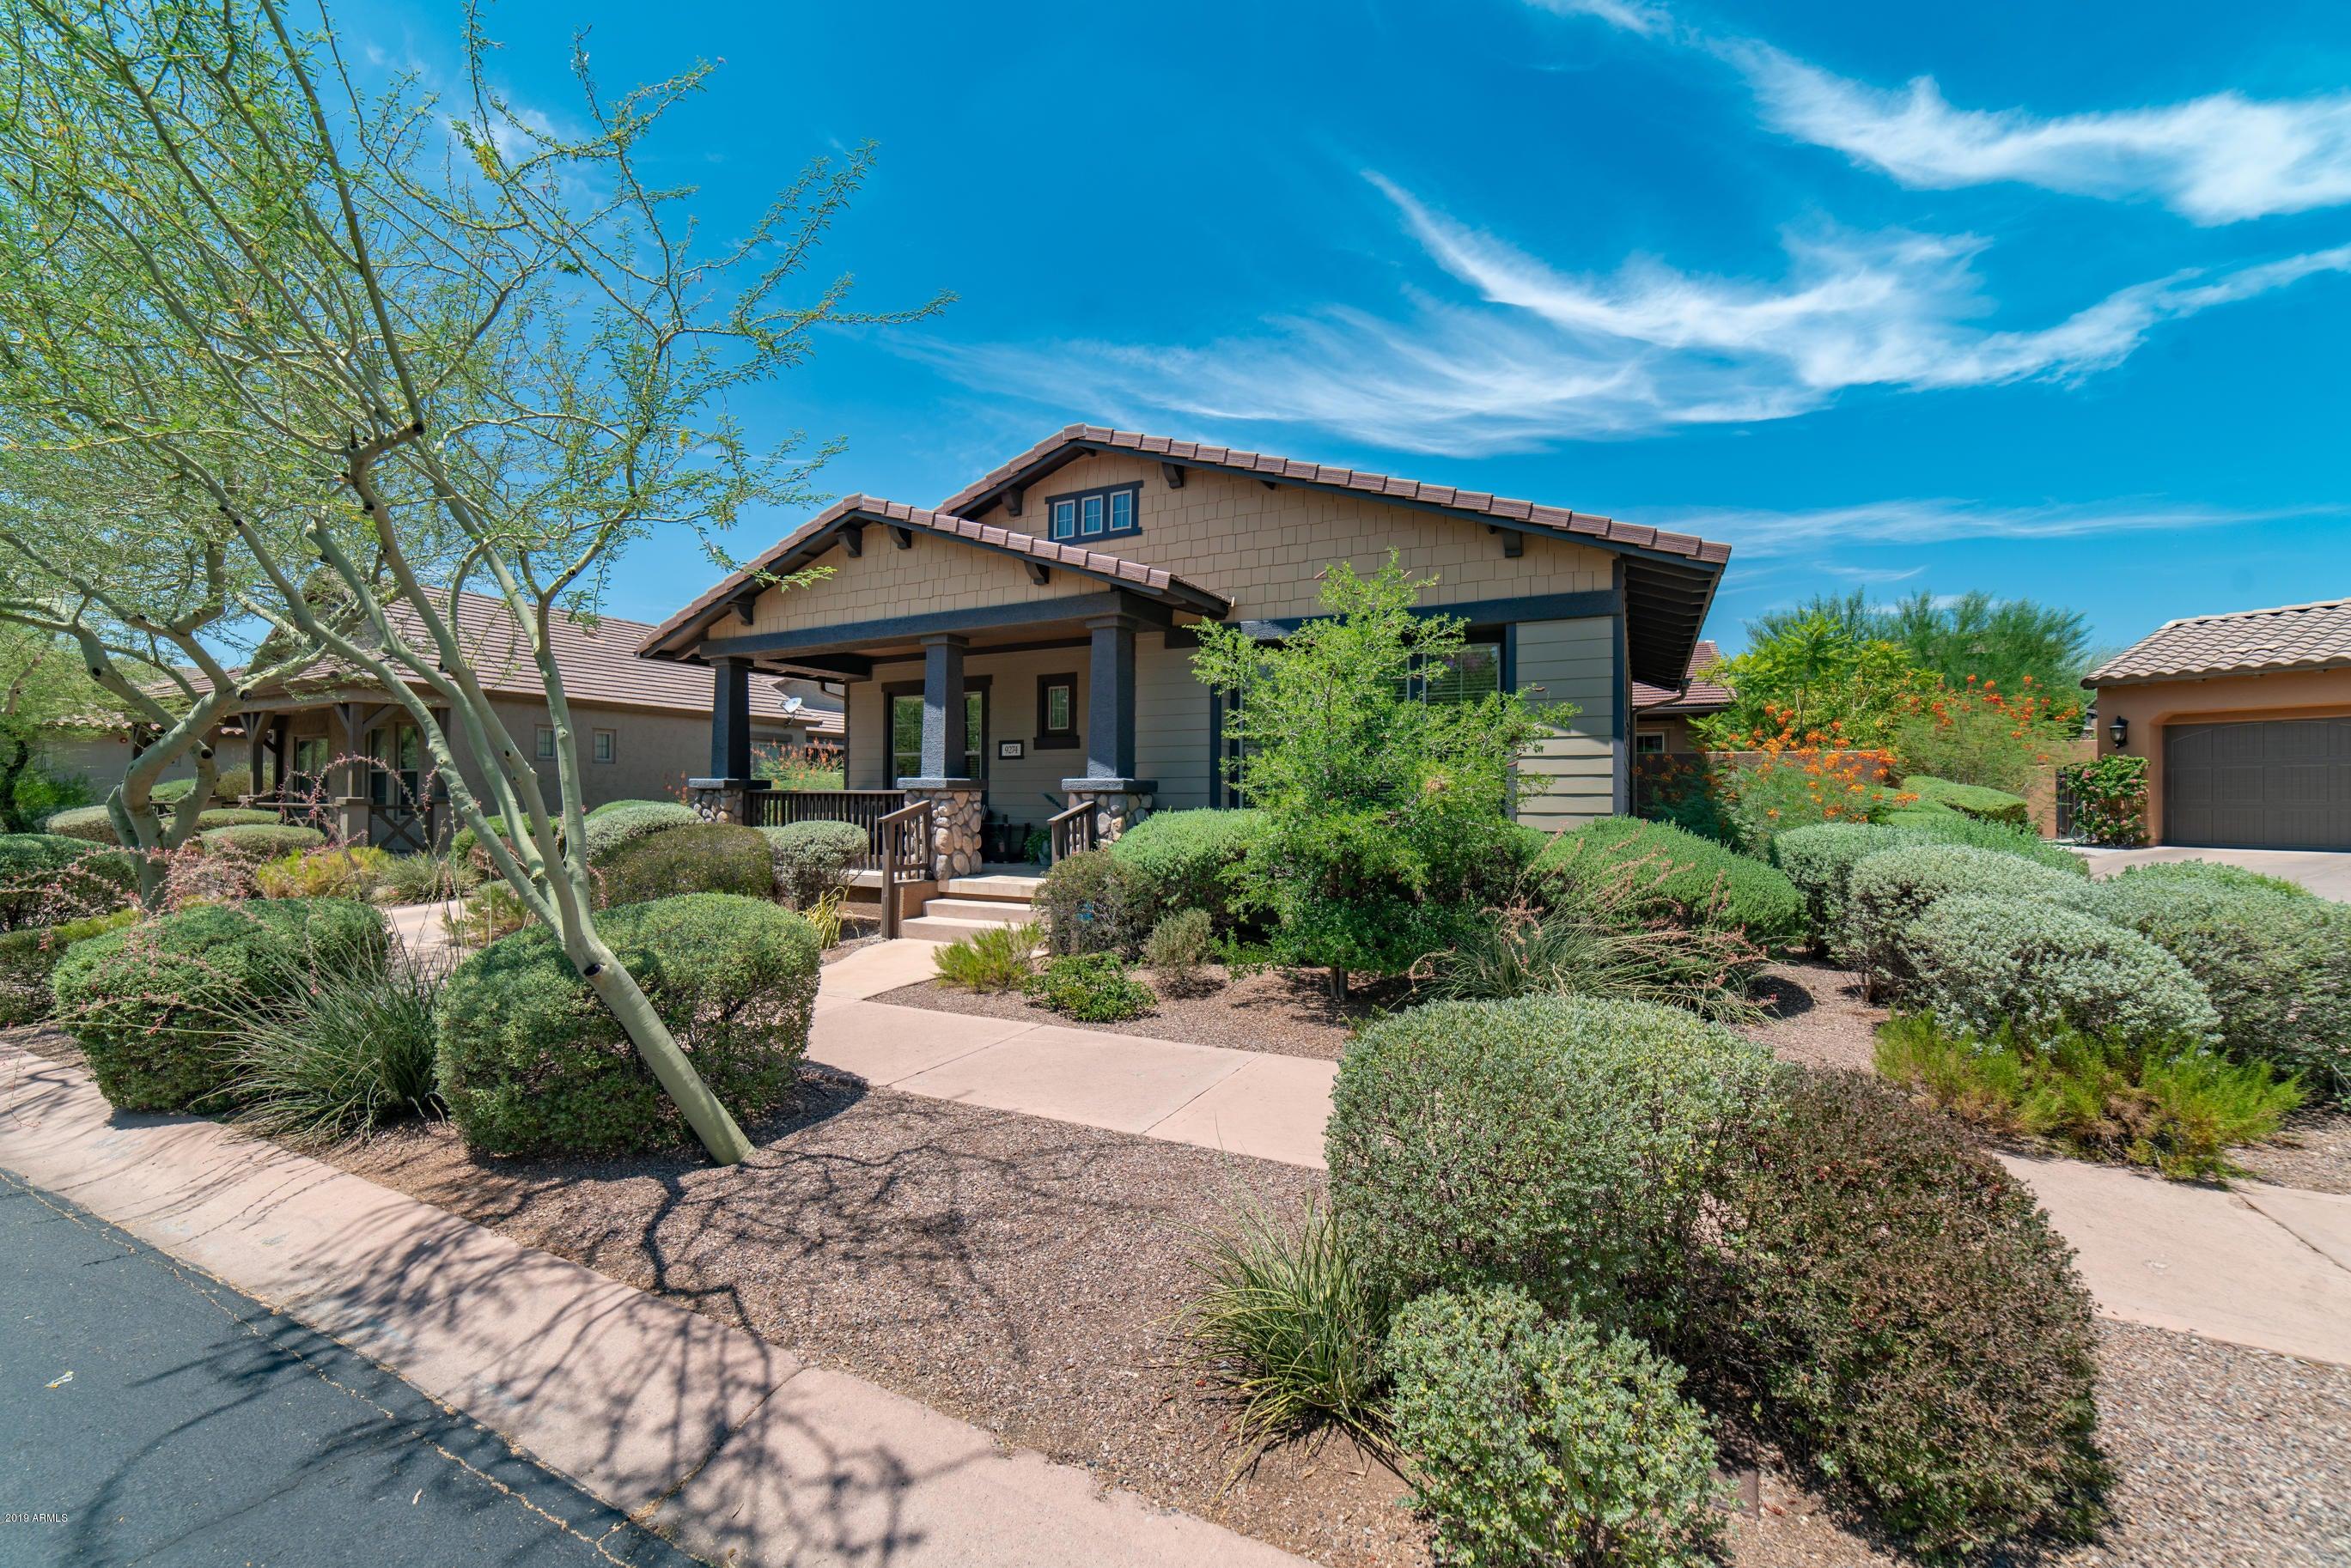 9274 E VIA DE VAQUERO Drive, Scottsdale, AZ 85255